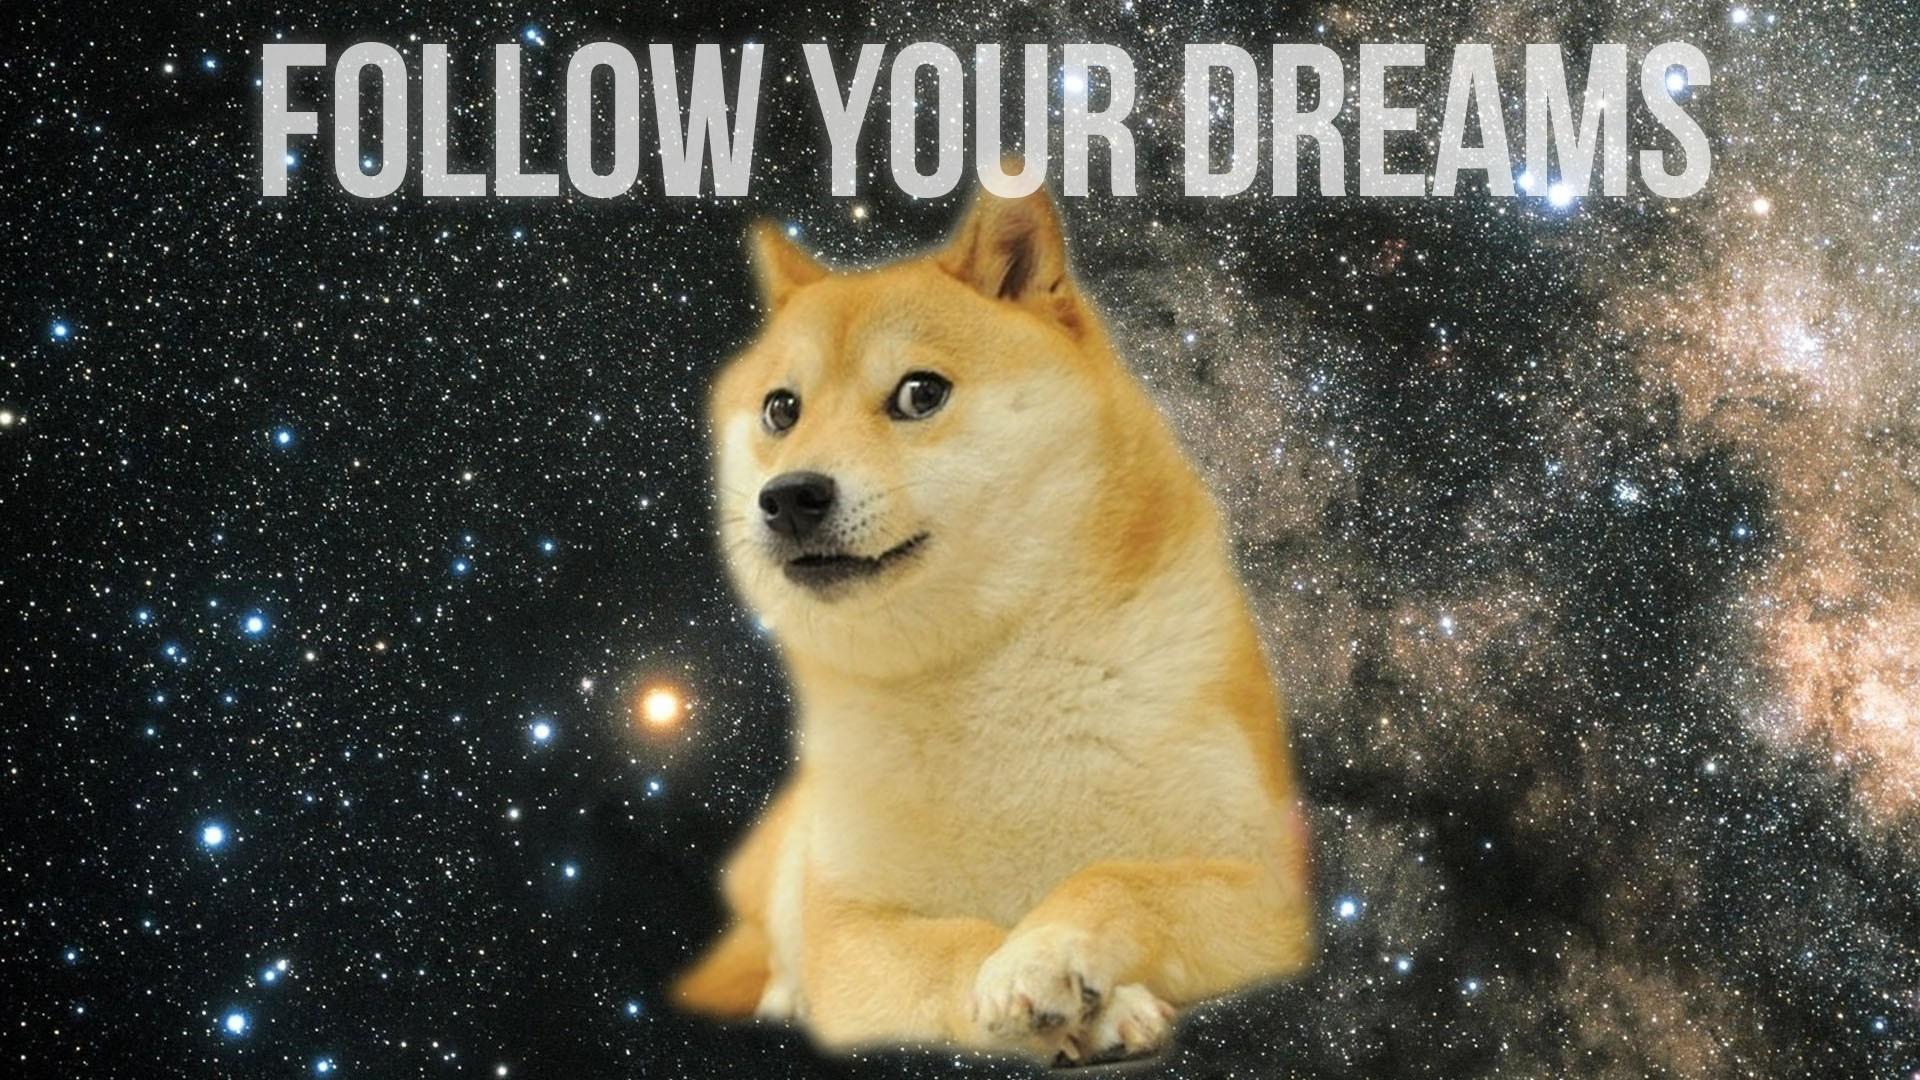 Doge meme wallpaper – photo#12